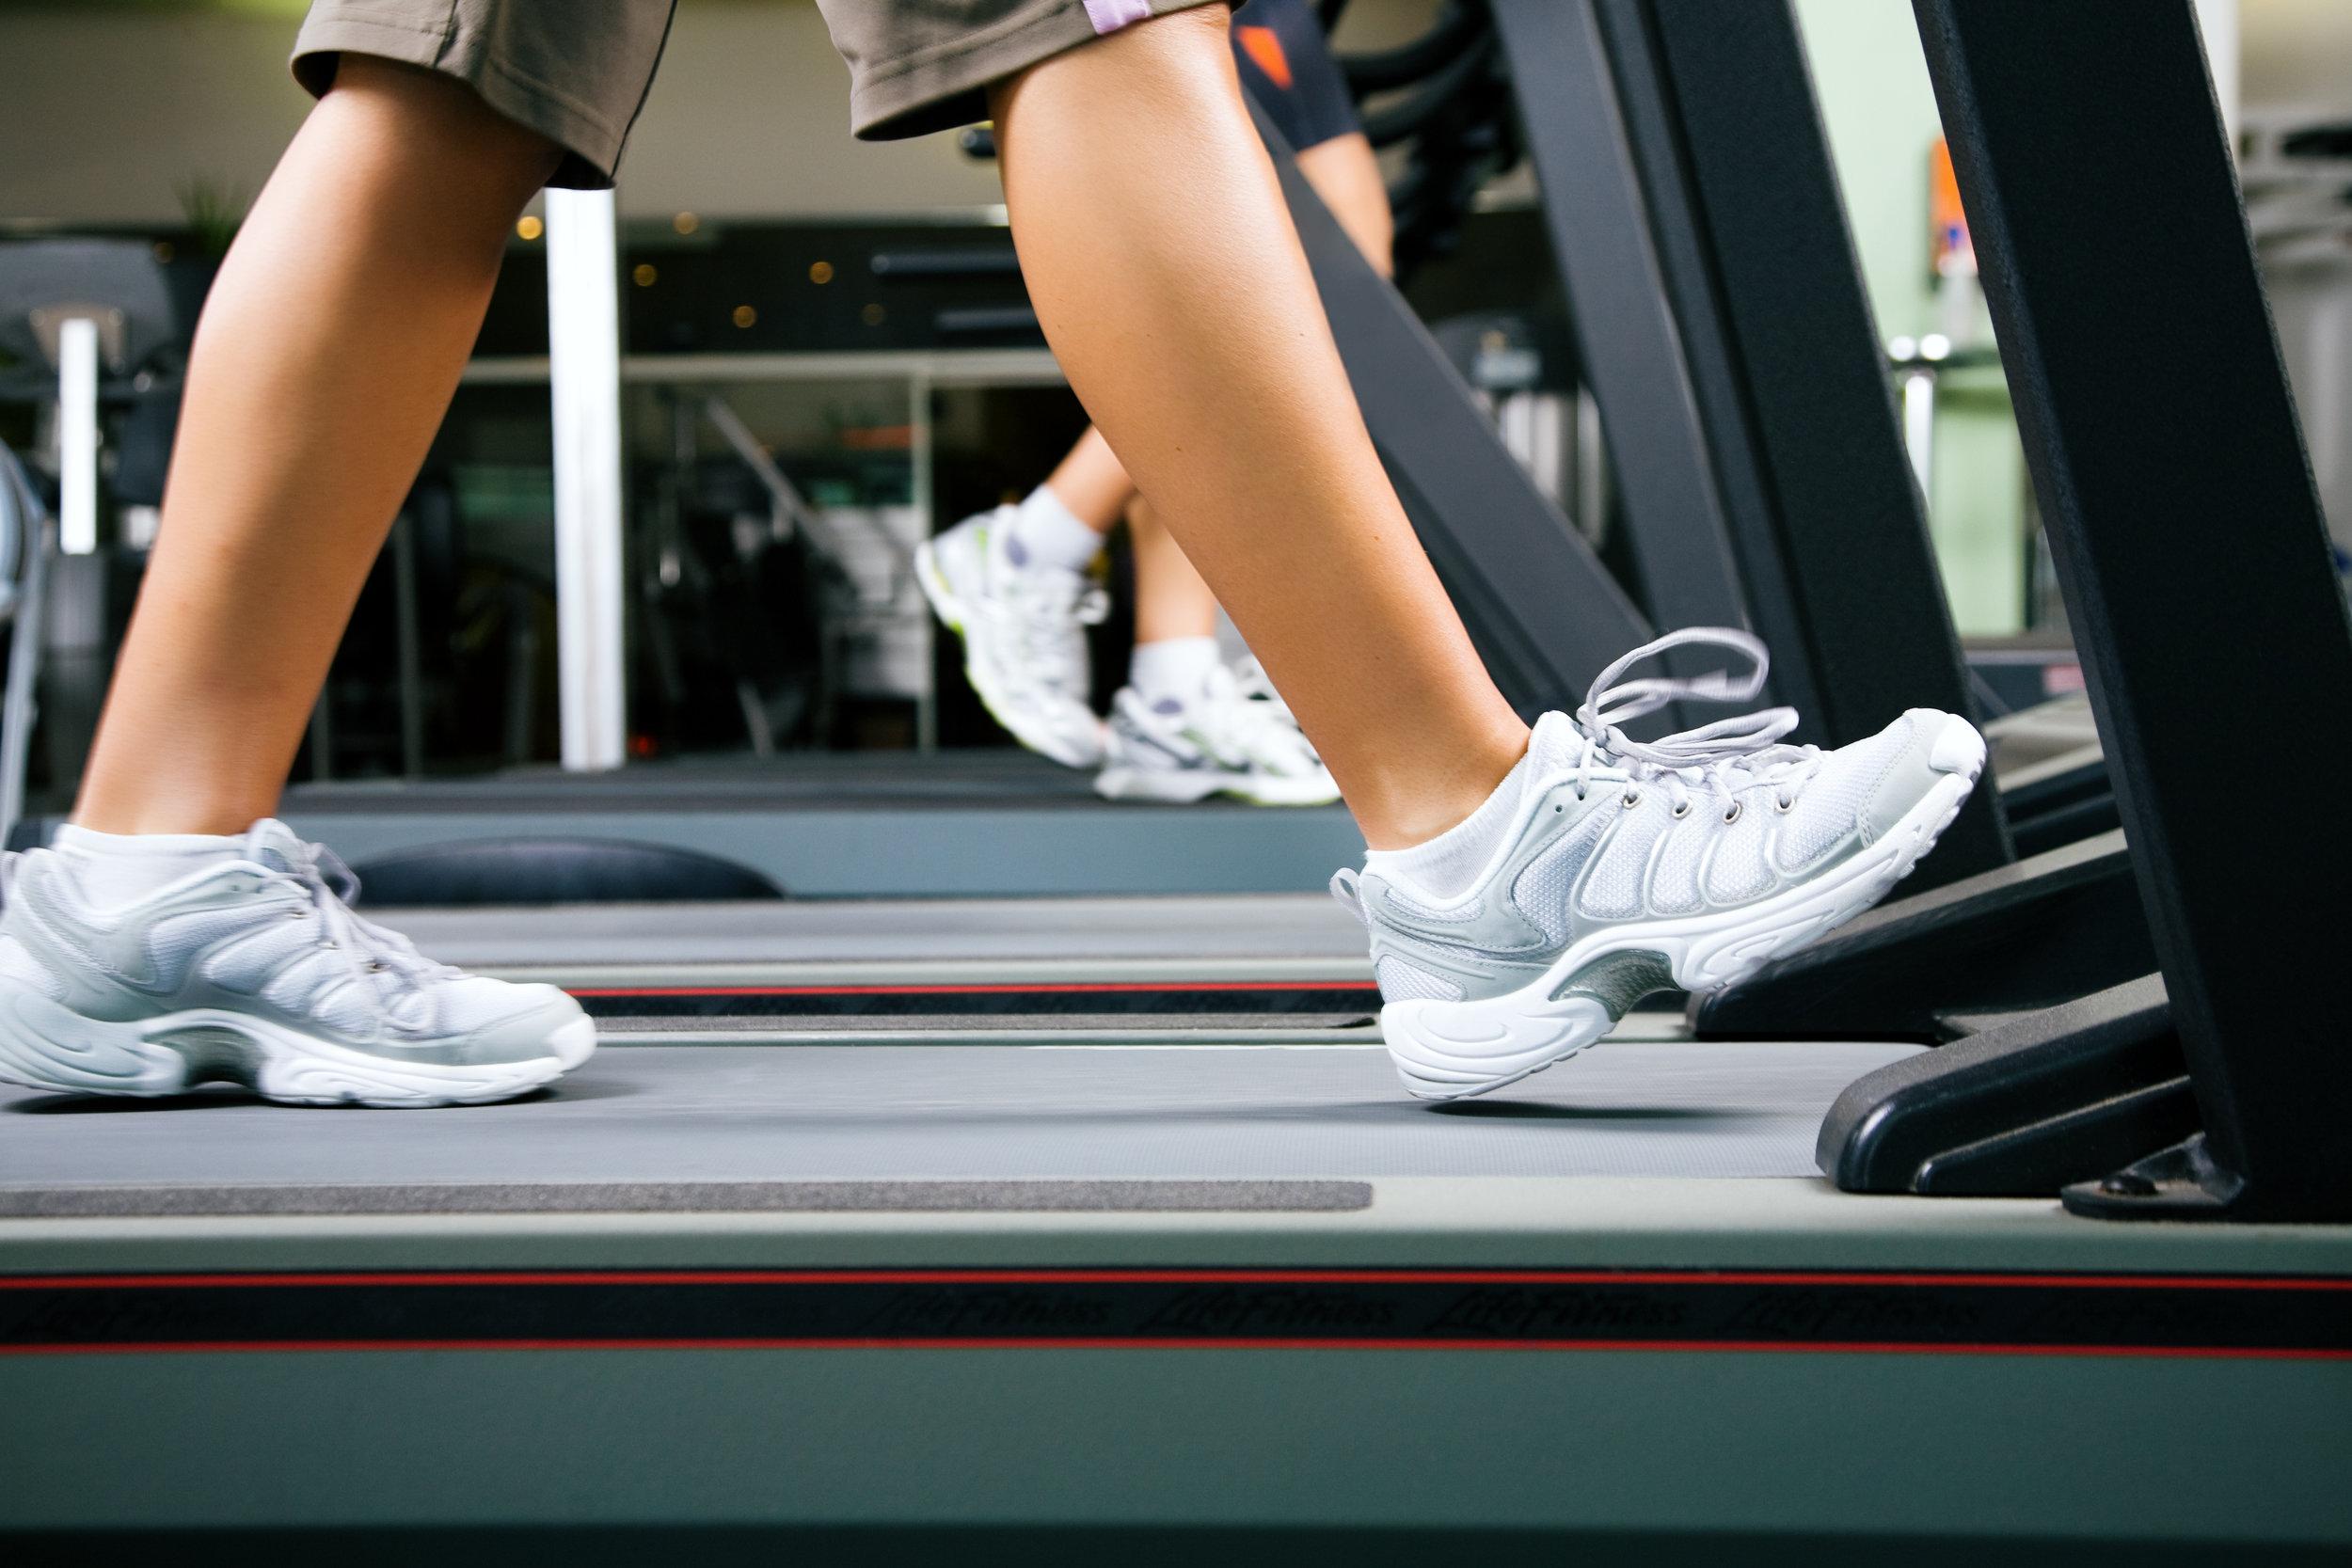 treadmill-feet-excercise-woman-walking-fitness-healthy.jpg